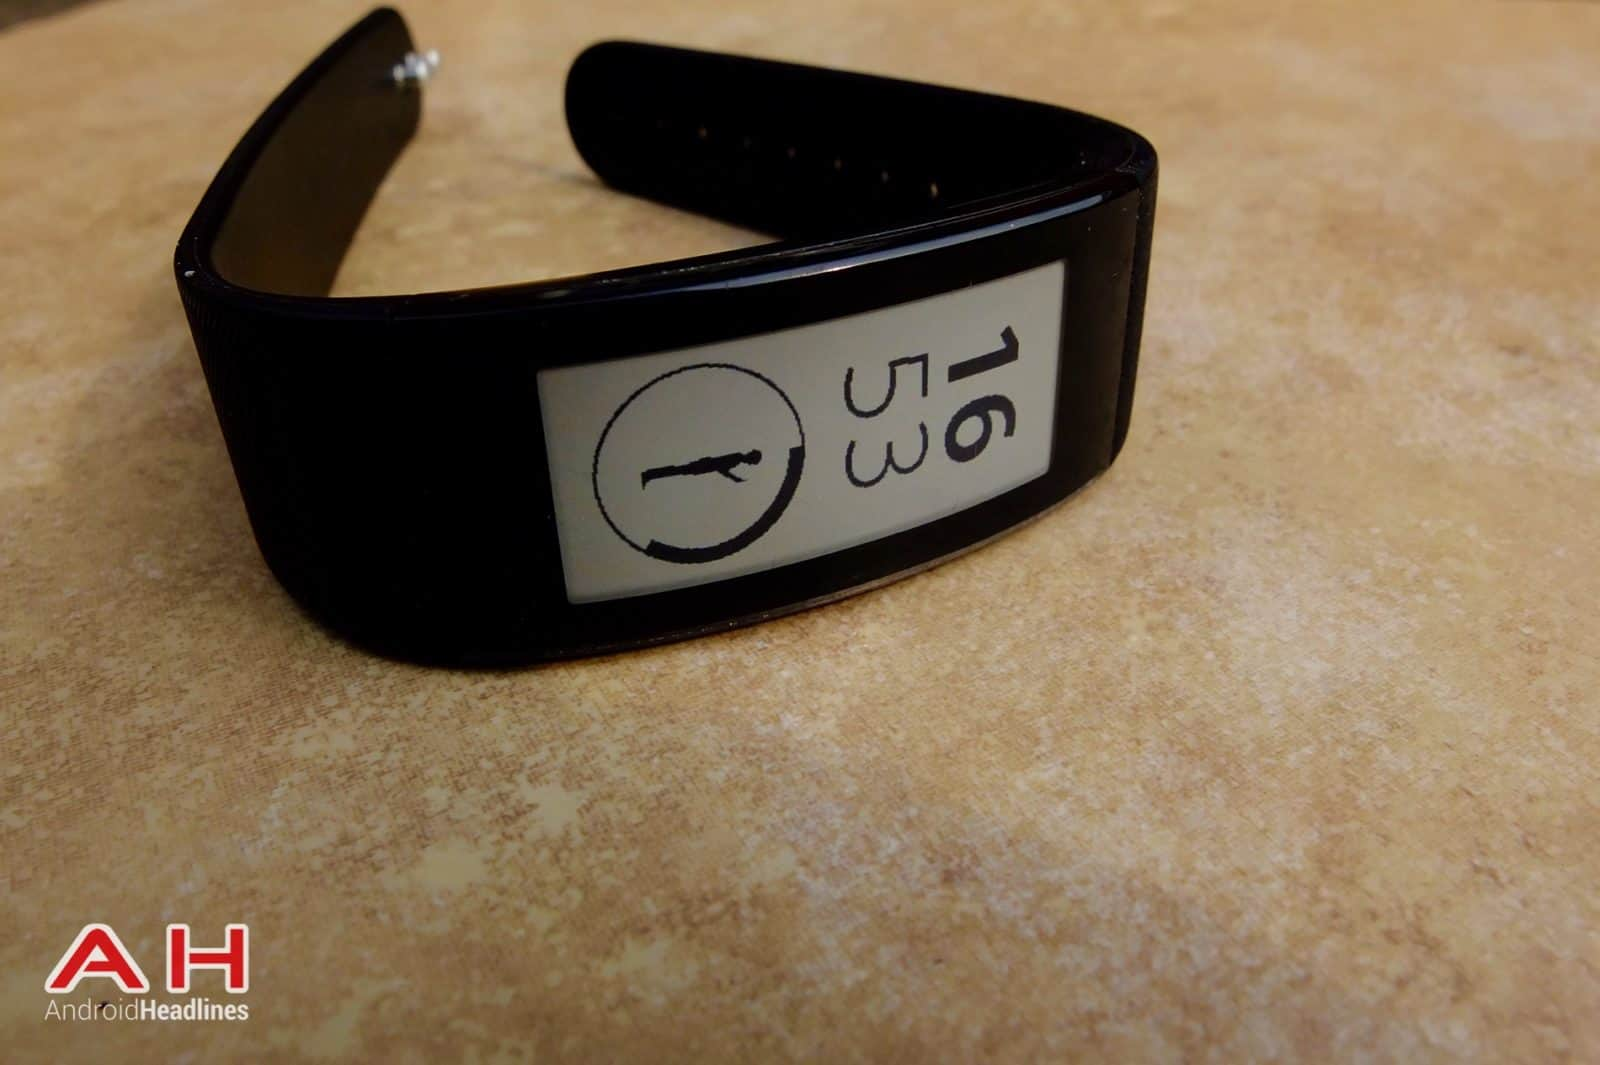 Sony SmartBand Talk AH 11